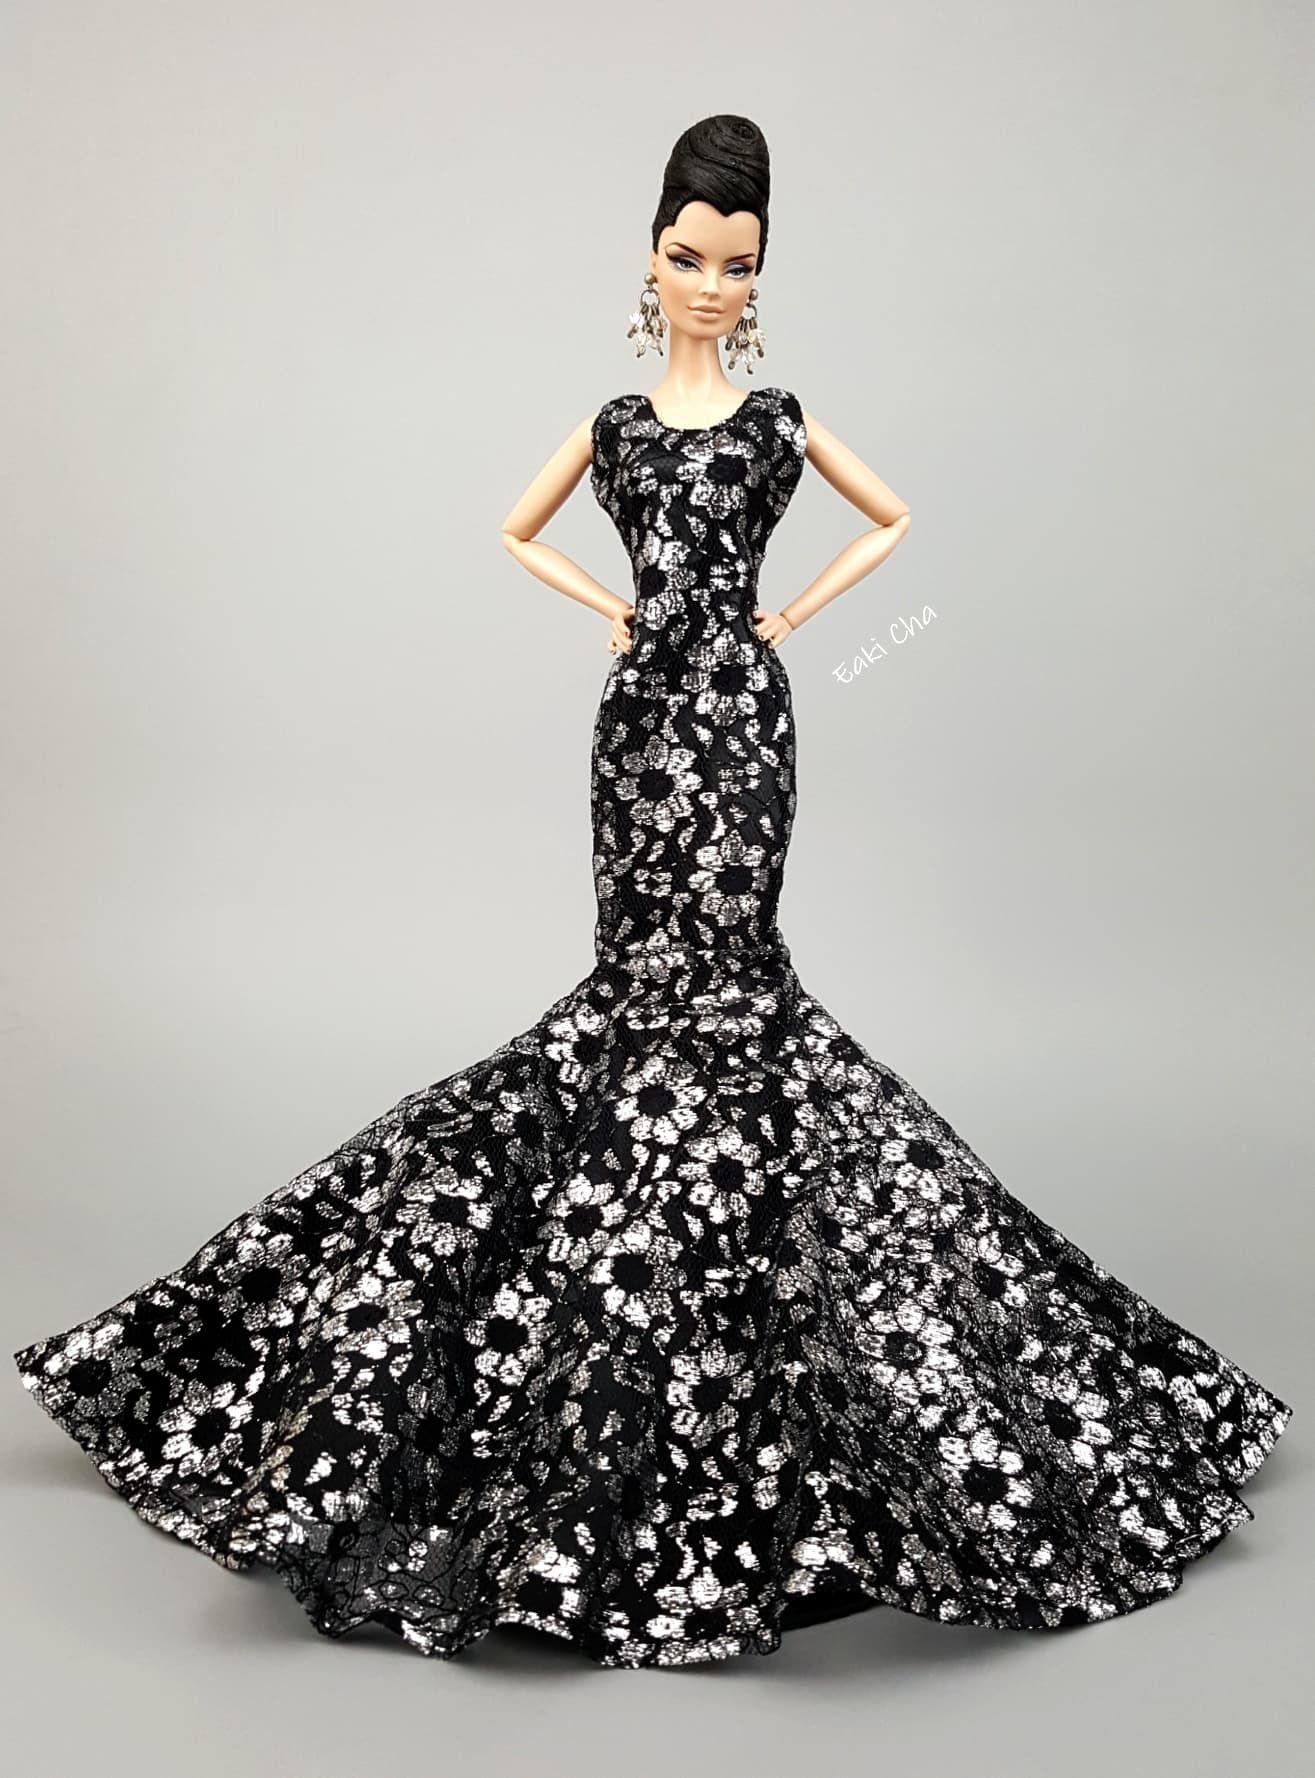 Eaki HandMade White Black Dress Outfit Gown For Silkstone Fashion Royalty FR